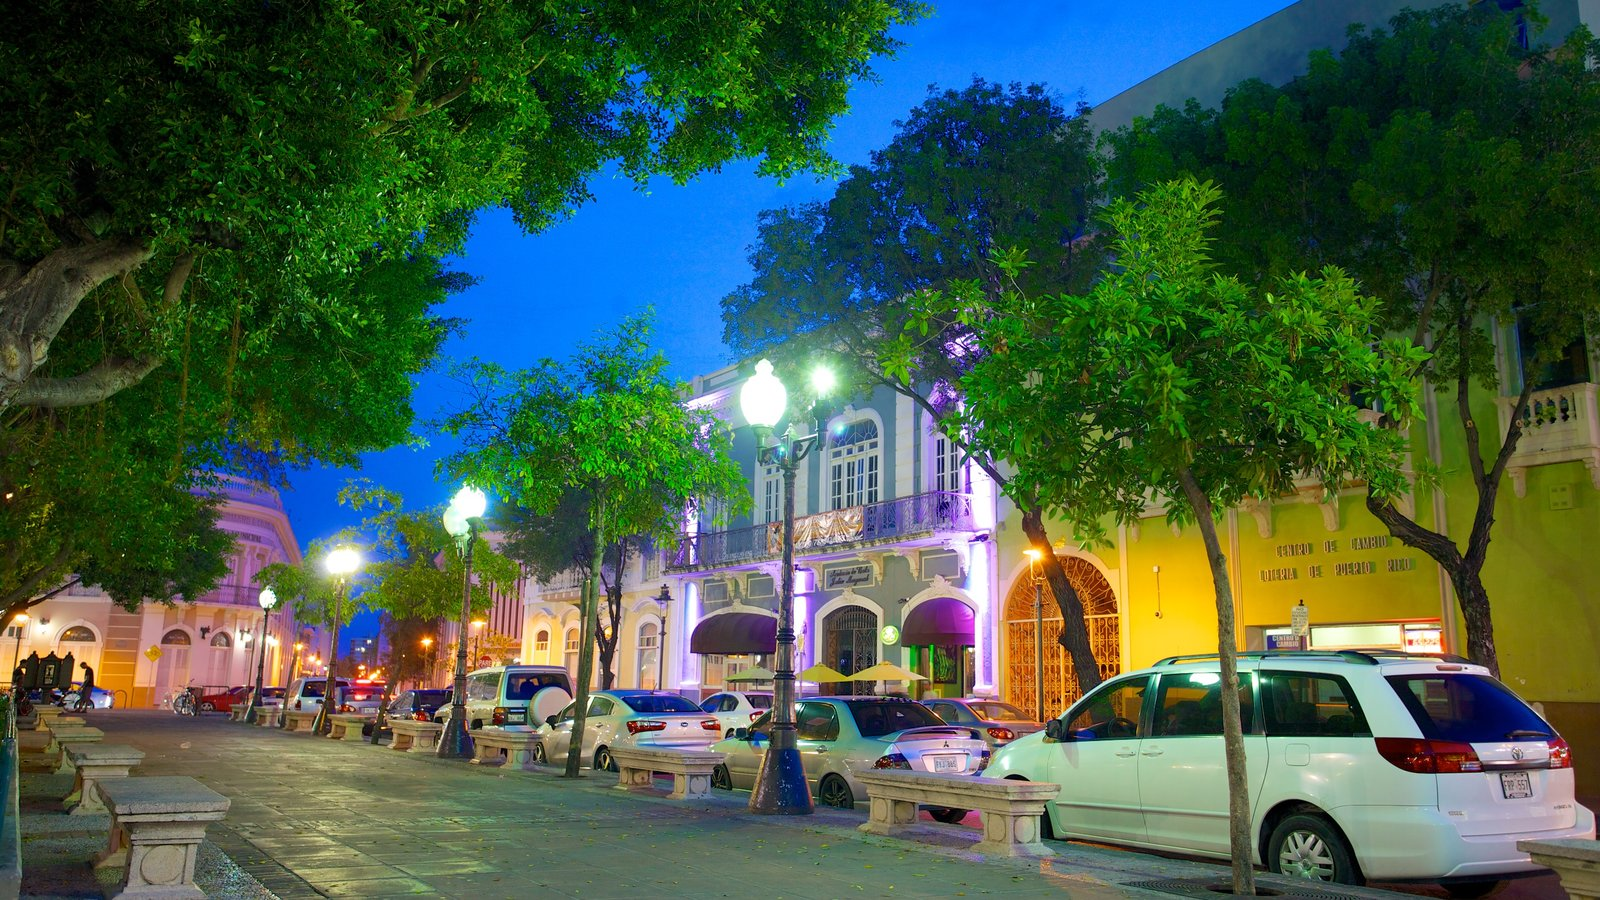 Parque de Bombas which includes street scenes and night scenes